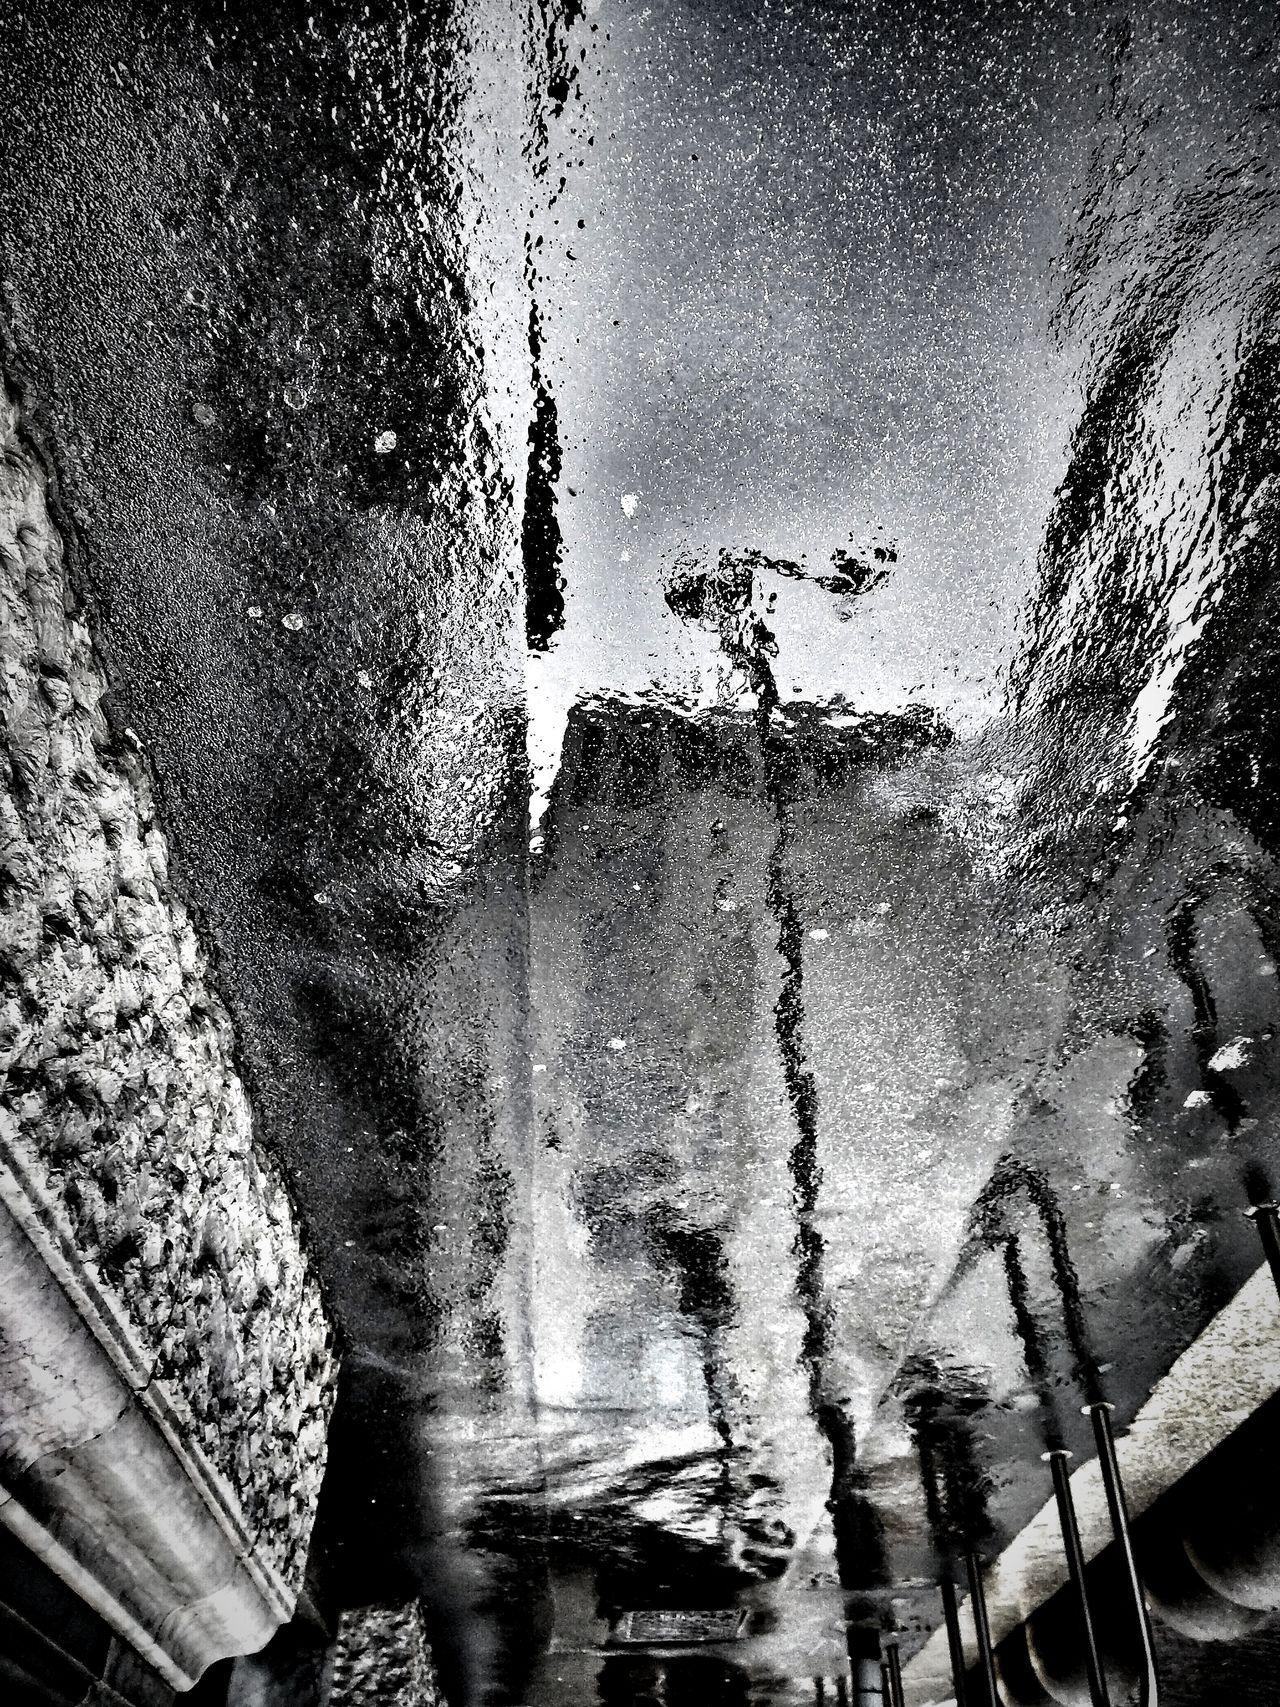 Blackandwhite Rainy Day Walking In The Rain Urban Reflections Upside Down